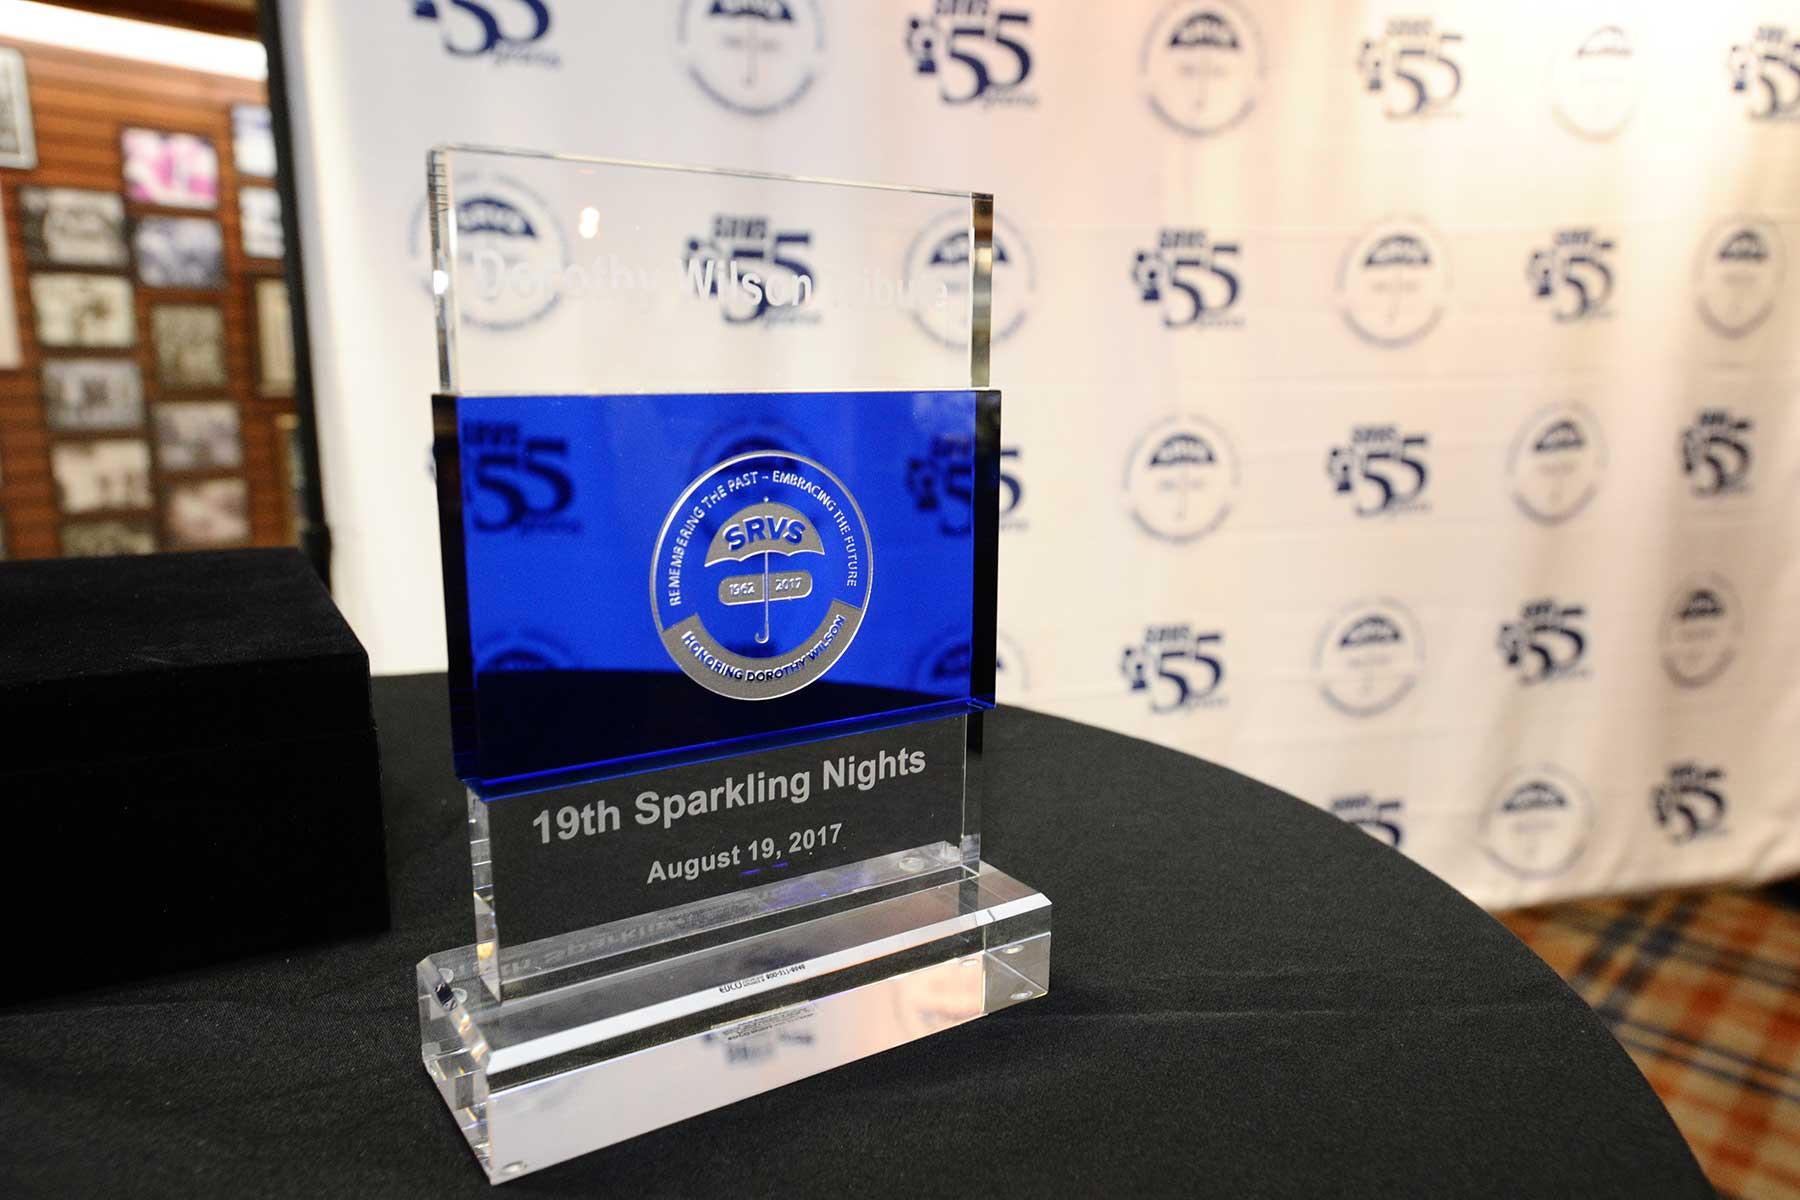 SRVS Sparkling Nights 201